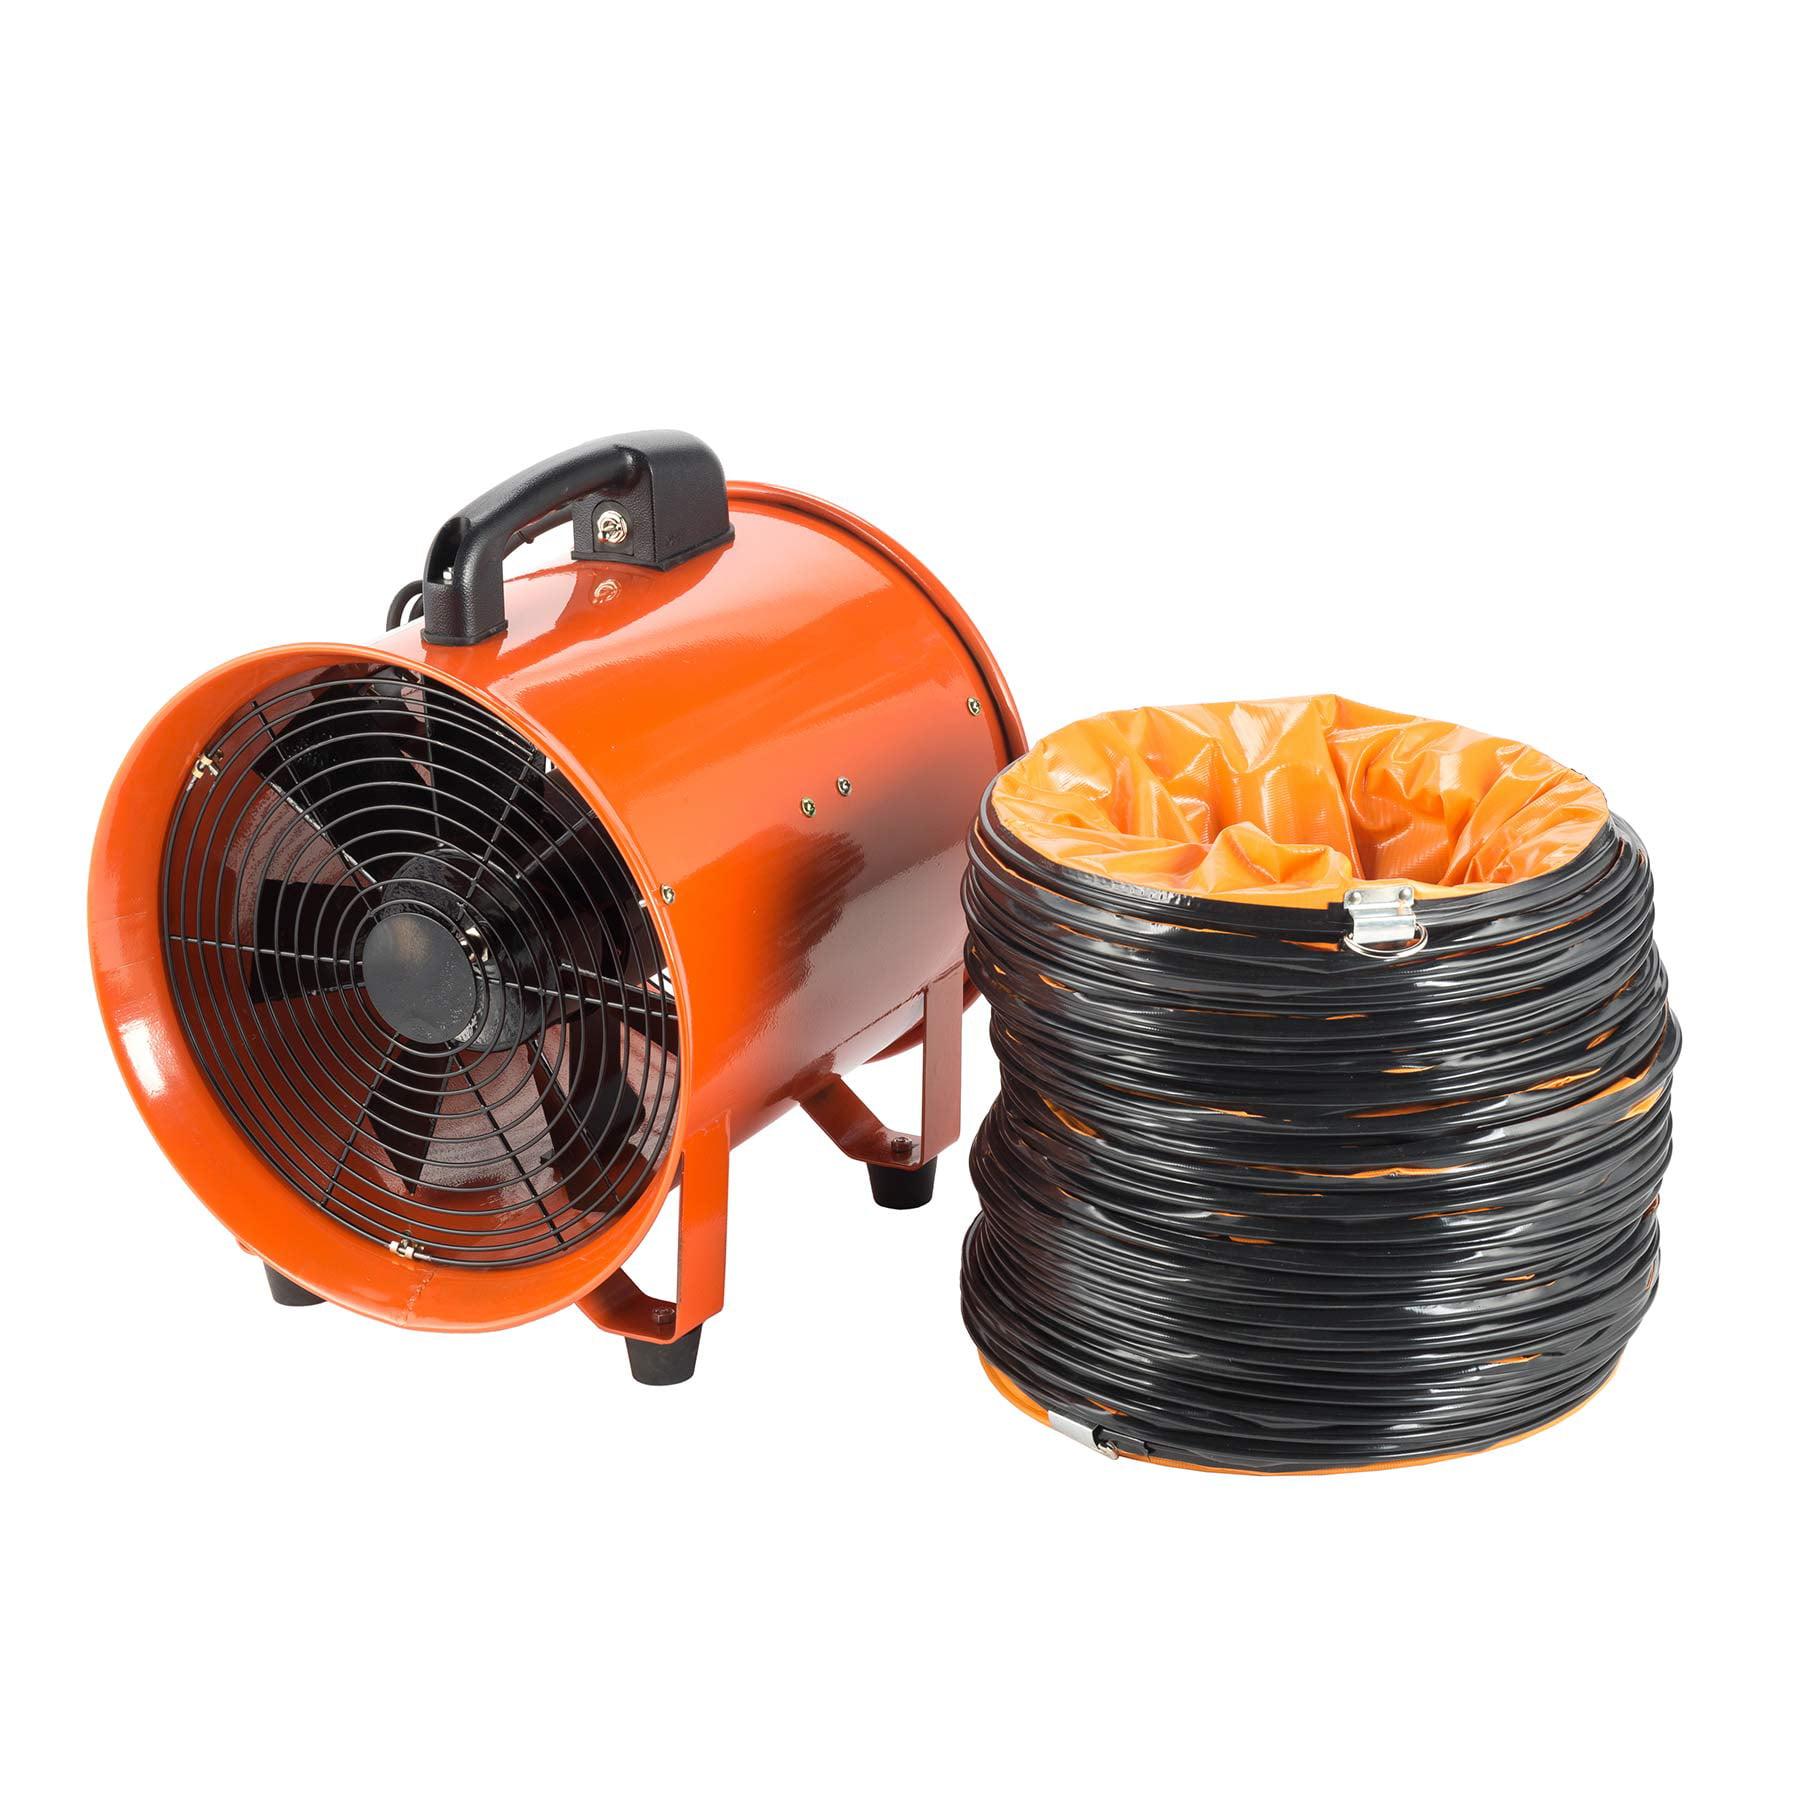 12 Inch 0.7HP 2295 CFM 2800 RPM Extractor Fan Blower